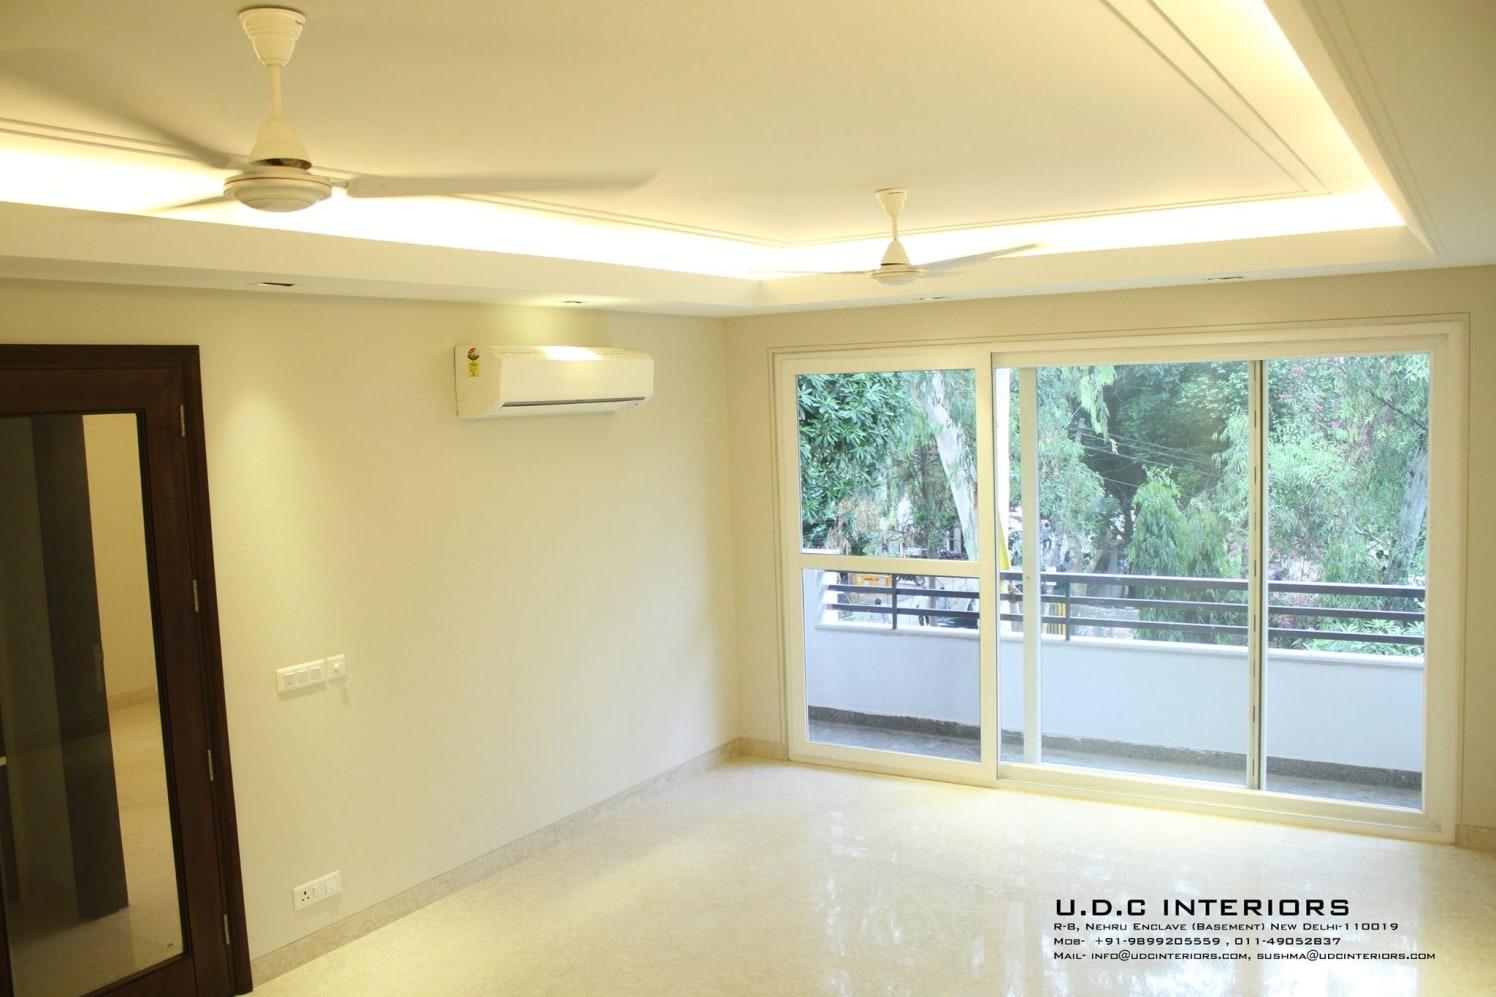 Sharp White Drawing Room by UDC Interiors Living-room Minimalistic | Interior Design Photos & Ideas